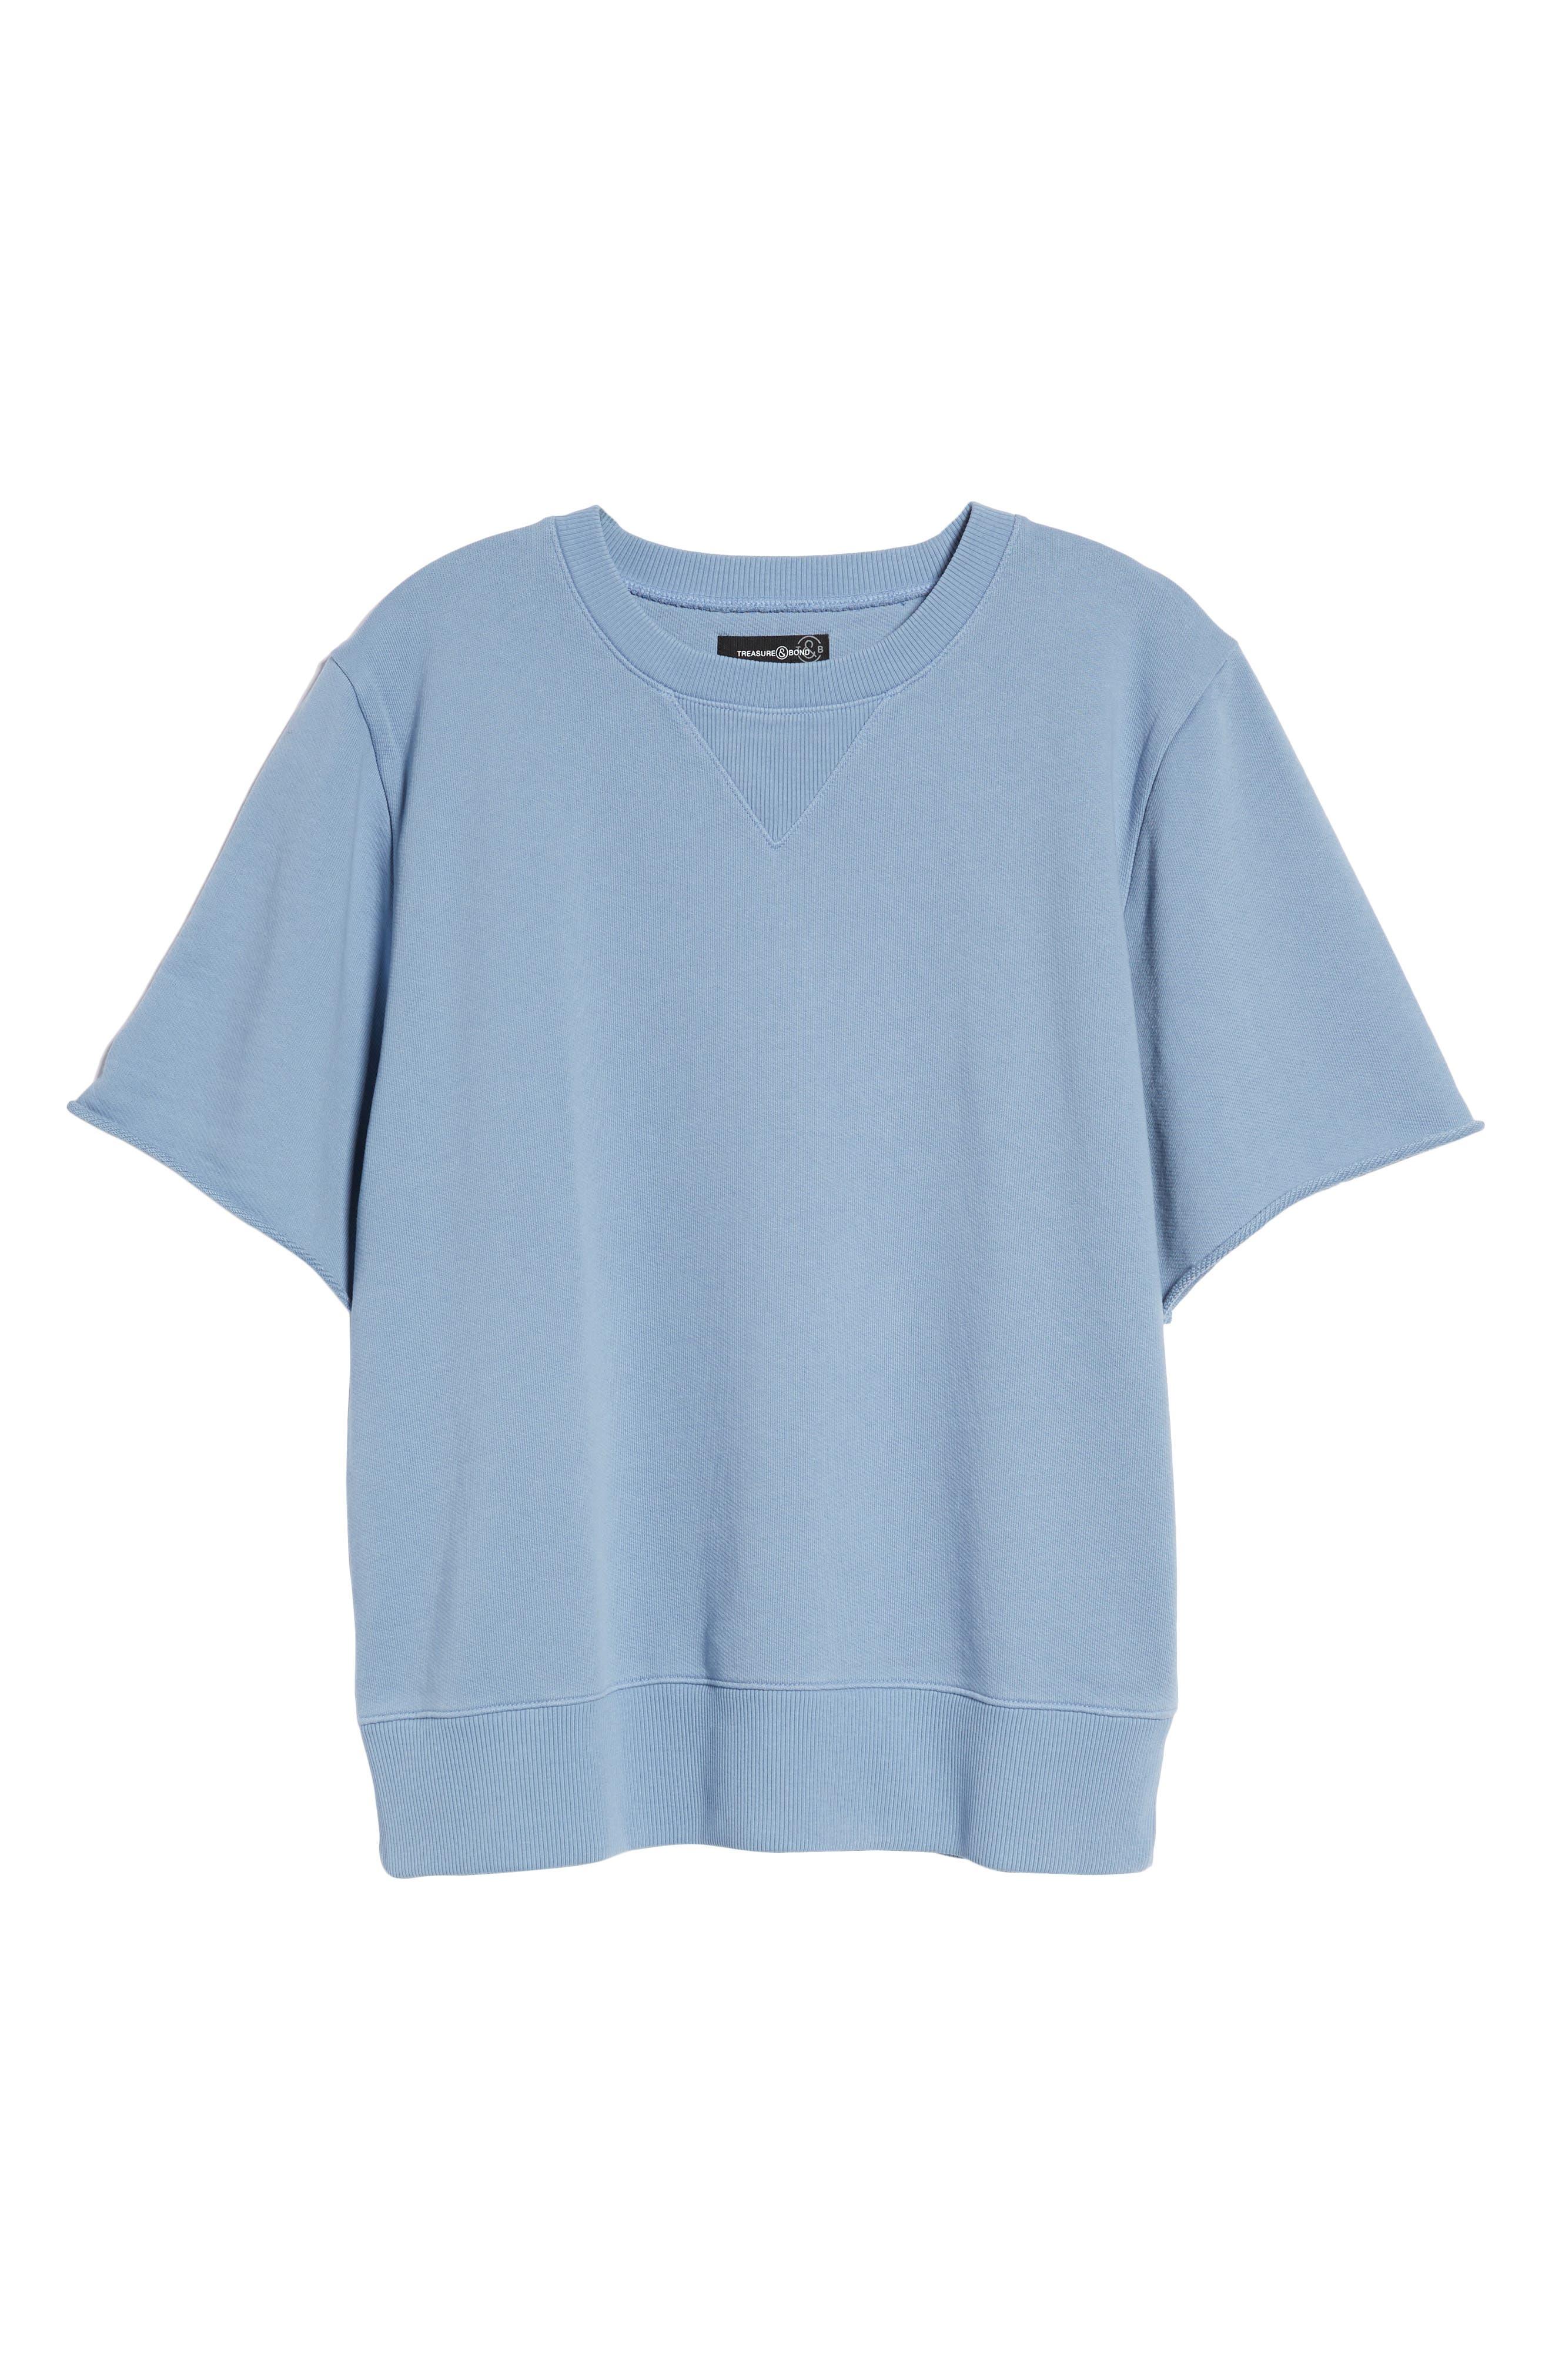 Cotton Terry Sweatshirt,                             Alternate thumbnail 11, color,